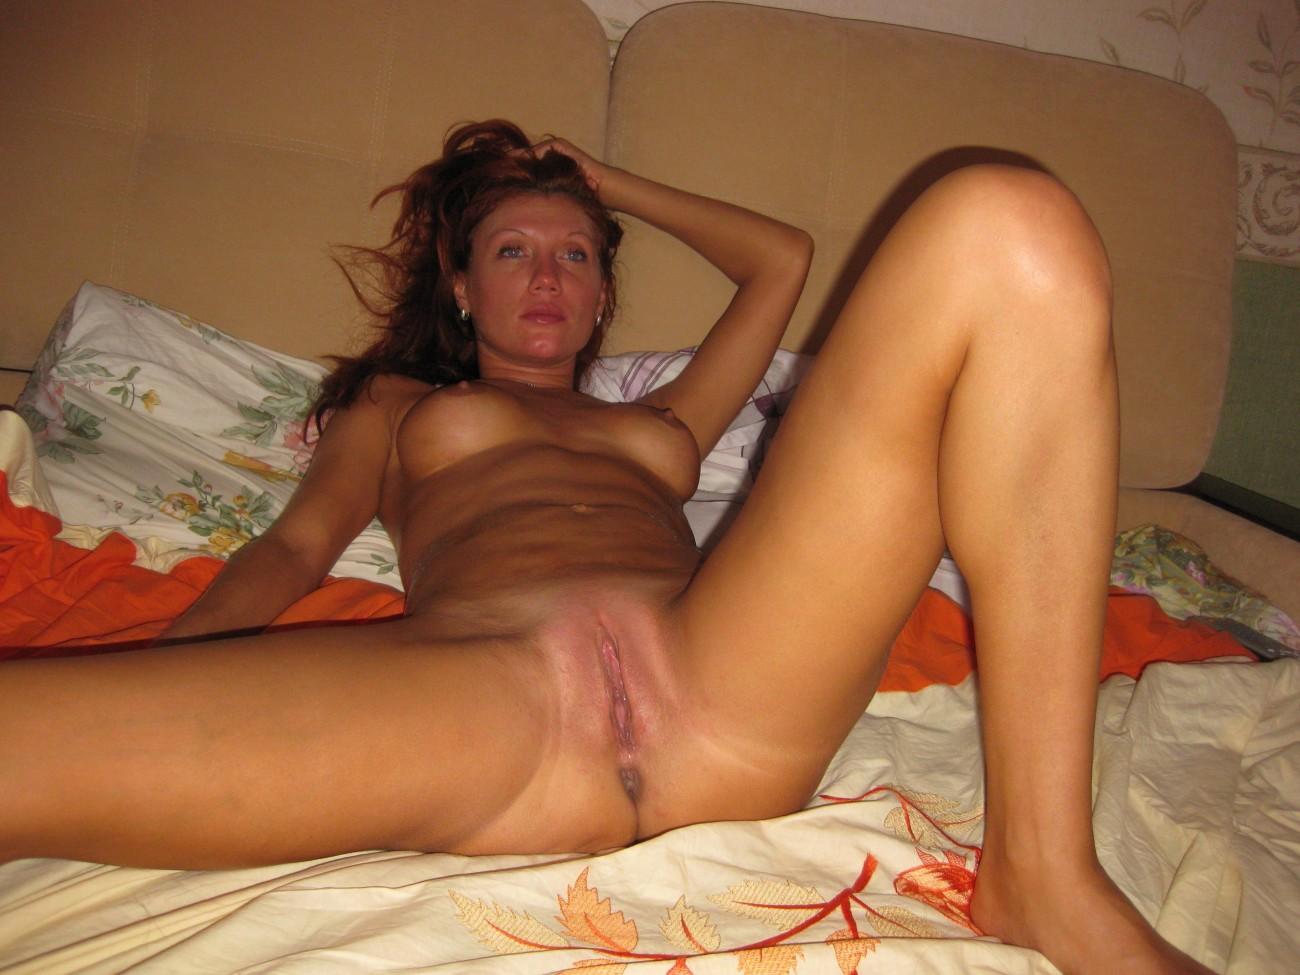 Albanian Women Naked Gallery Homemade Pics